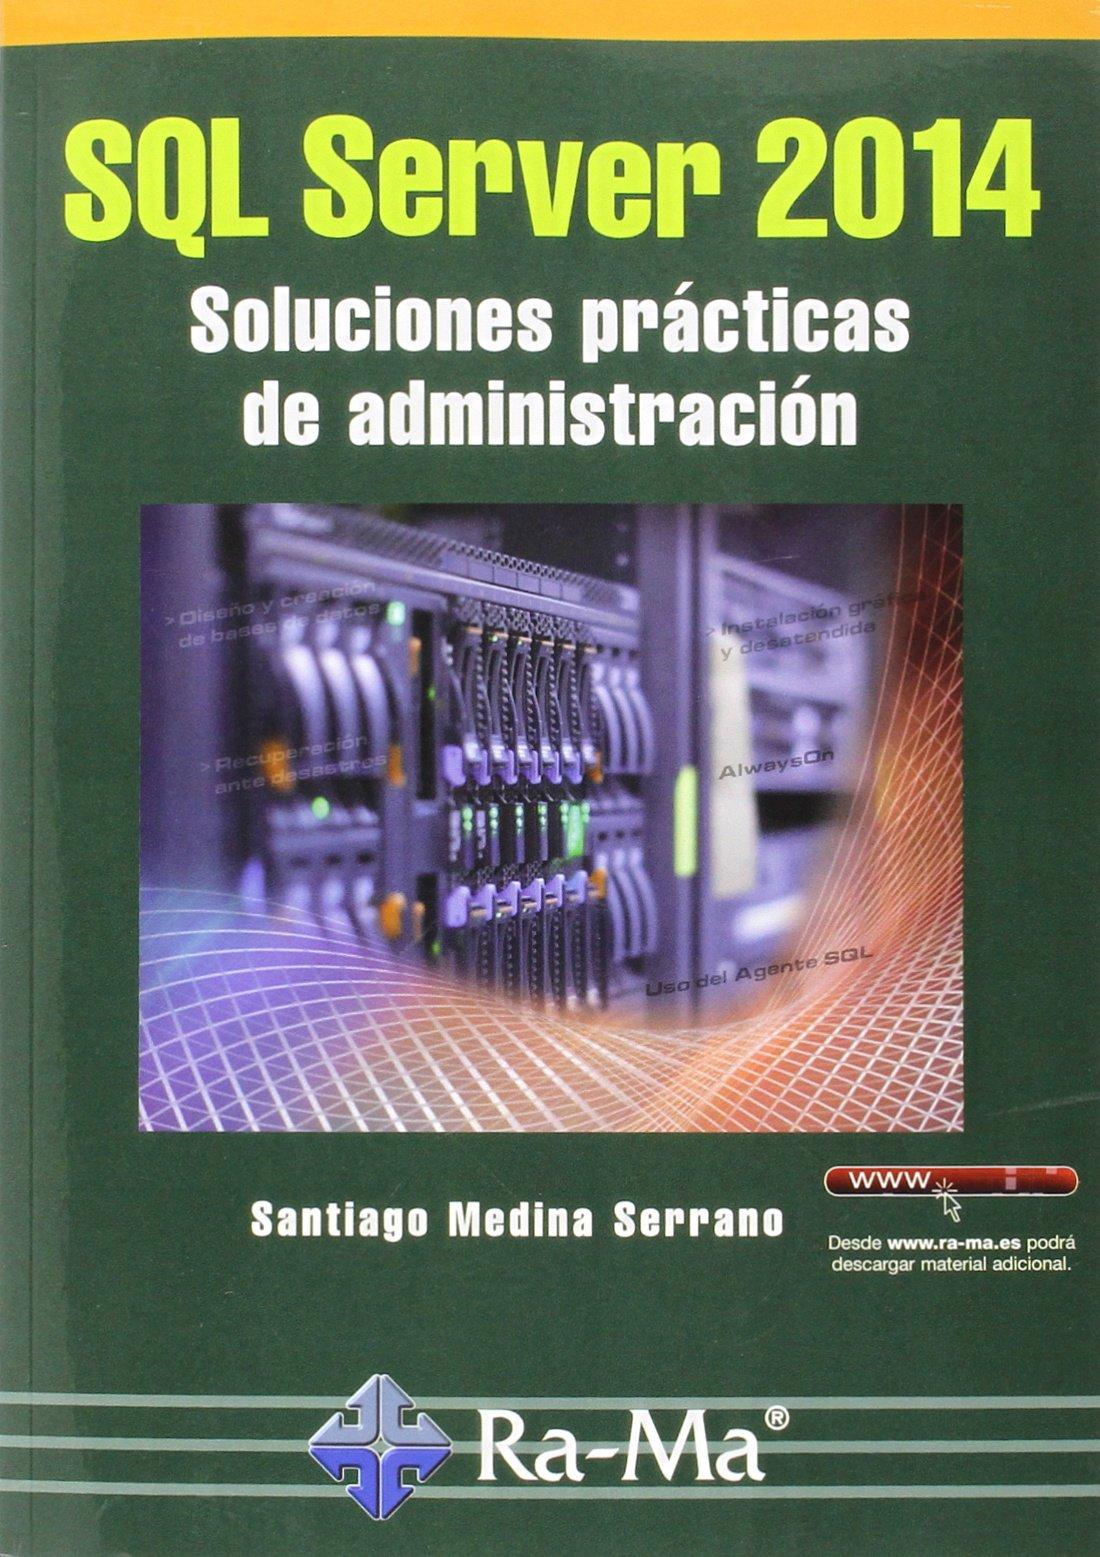 SQL Server 2014. Soluciones Prácticas De Administración Tapa blanda – 23 feb 2015 Santiago Medina Serrano Ra-Ma 8499645178 Databases